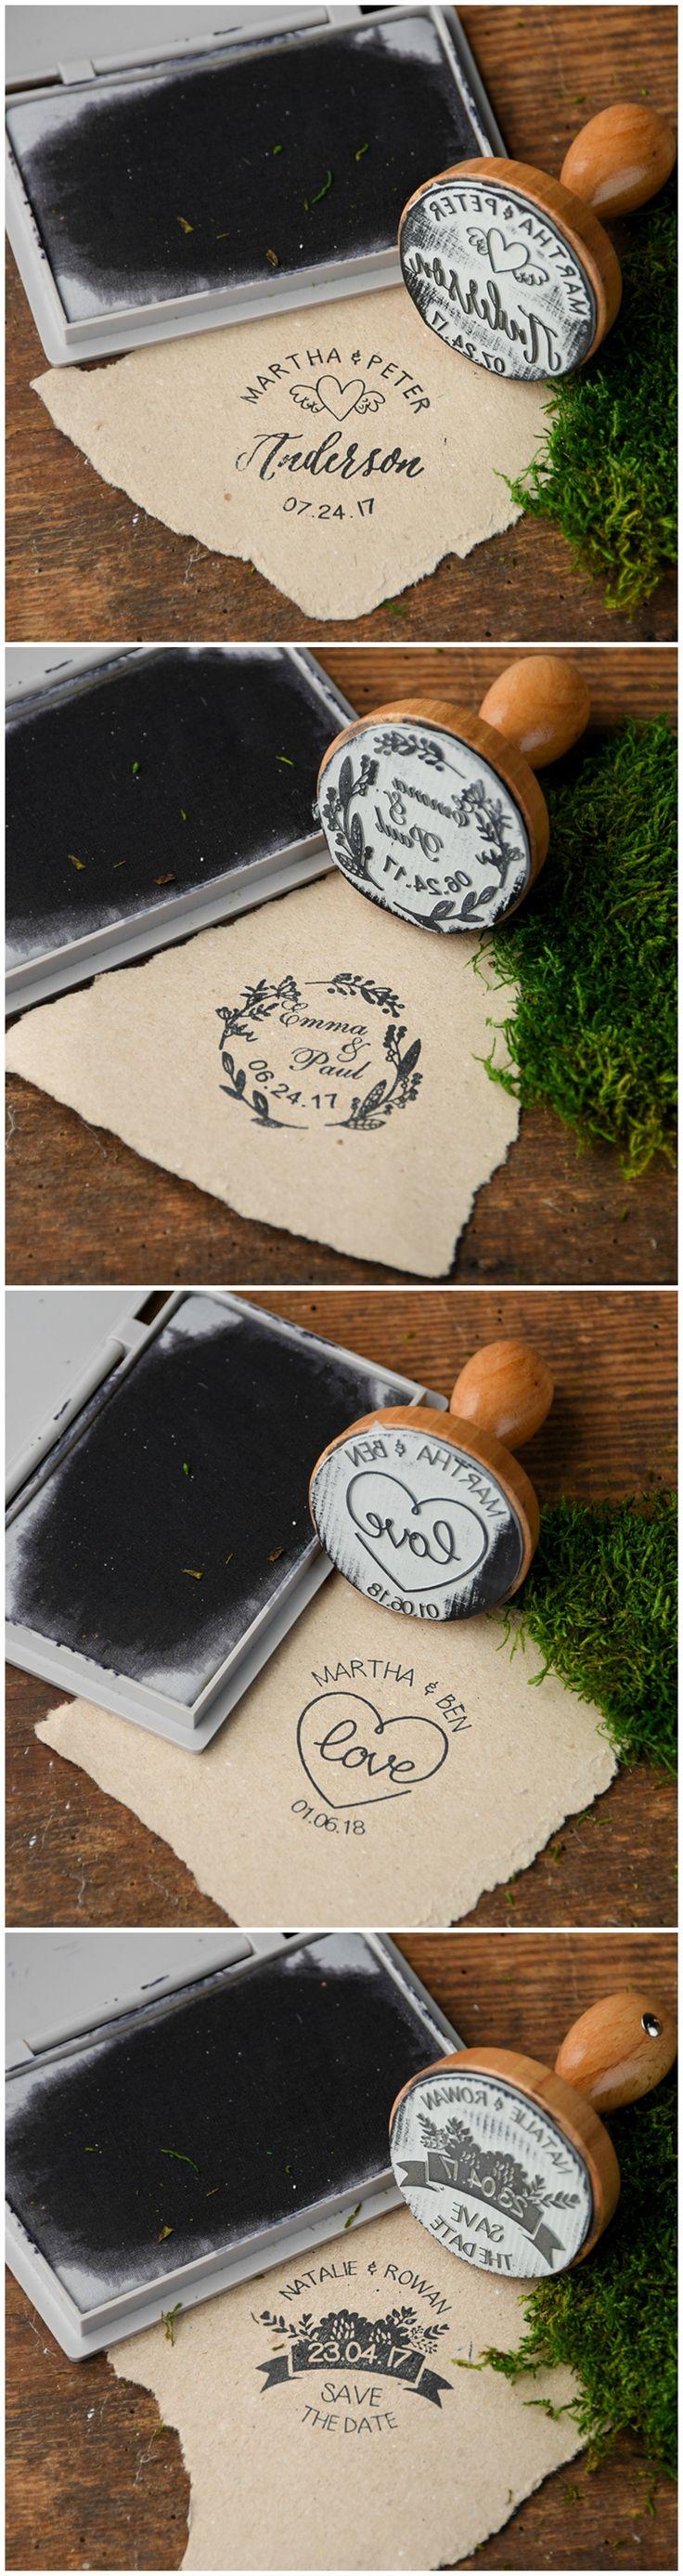 Wedding Wooden Custom Stamps #weddingideas #creative #weddingstamp #woodenstamp #rustic #eco #lovely #DIY #weddingprep #weddingpreparing #custom